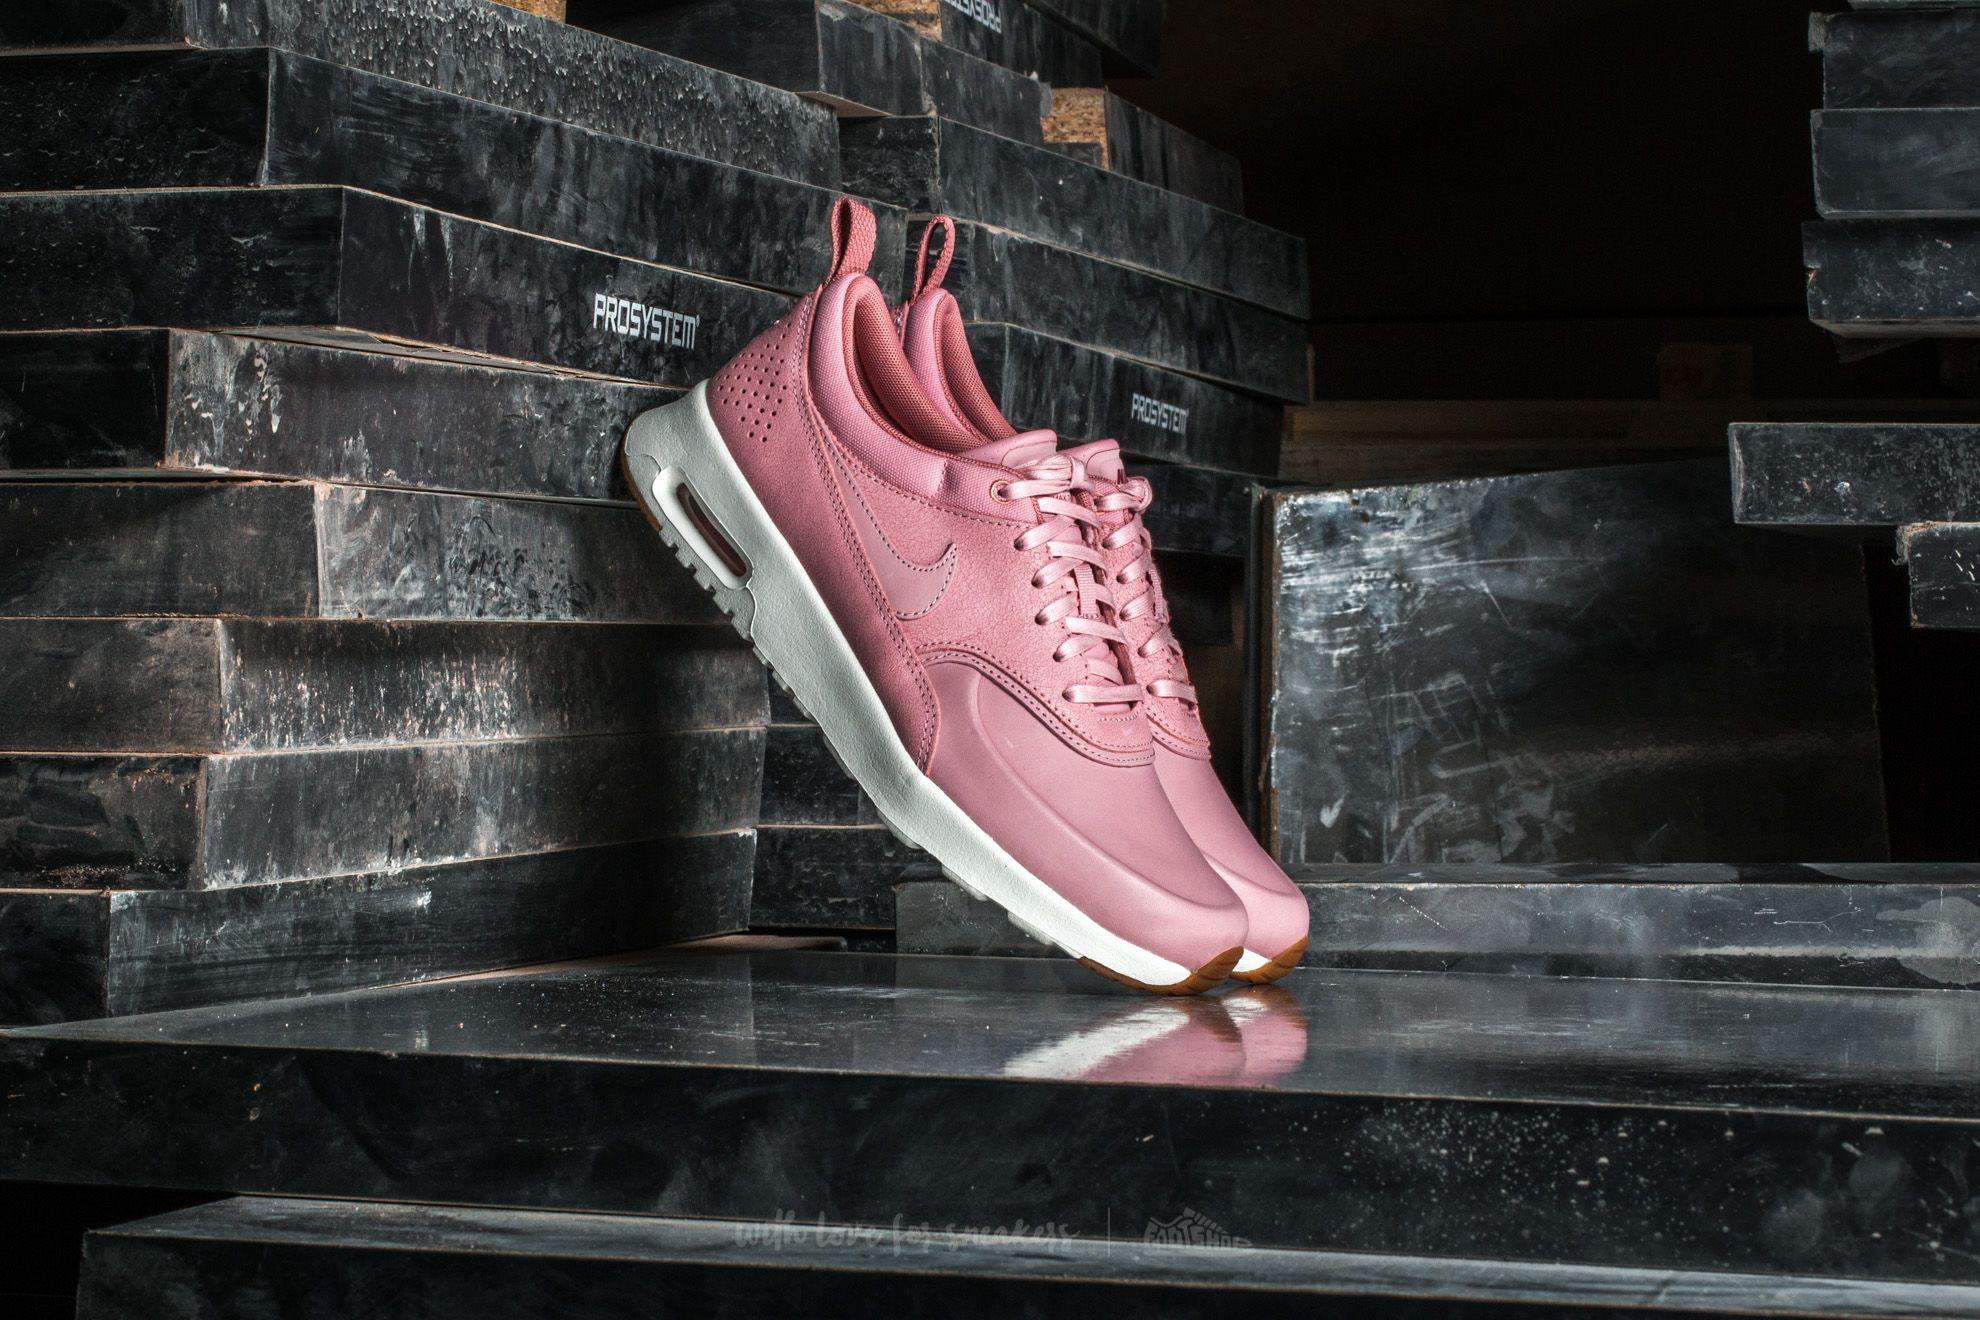 Nike Wmns Air Max Thea Premium Pink Glaze Pink Glaze Sail | Footshop